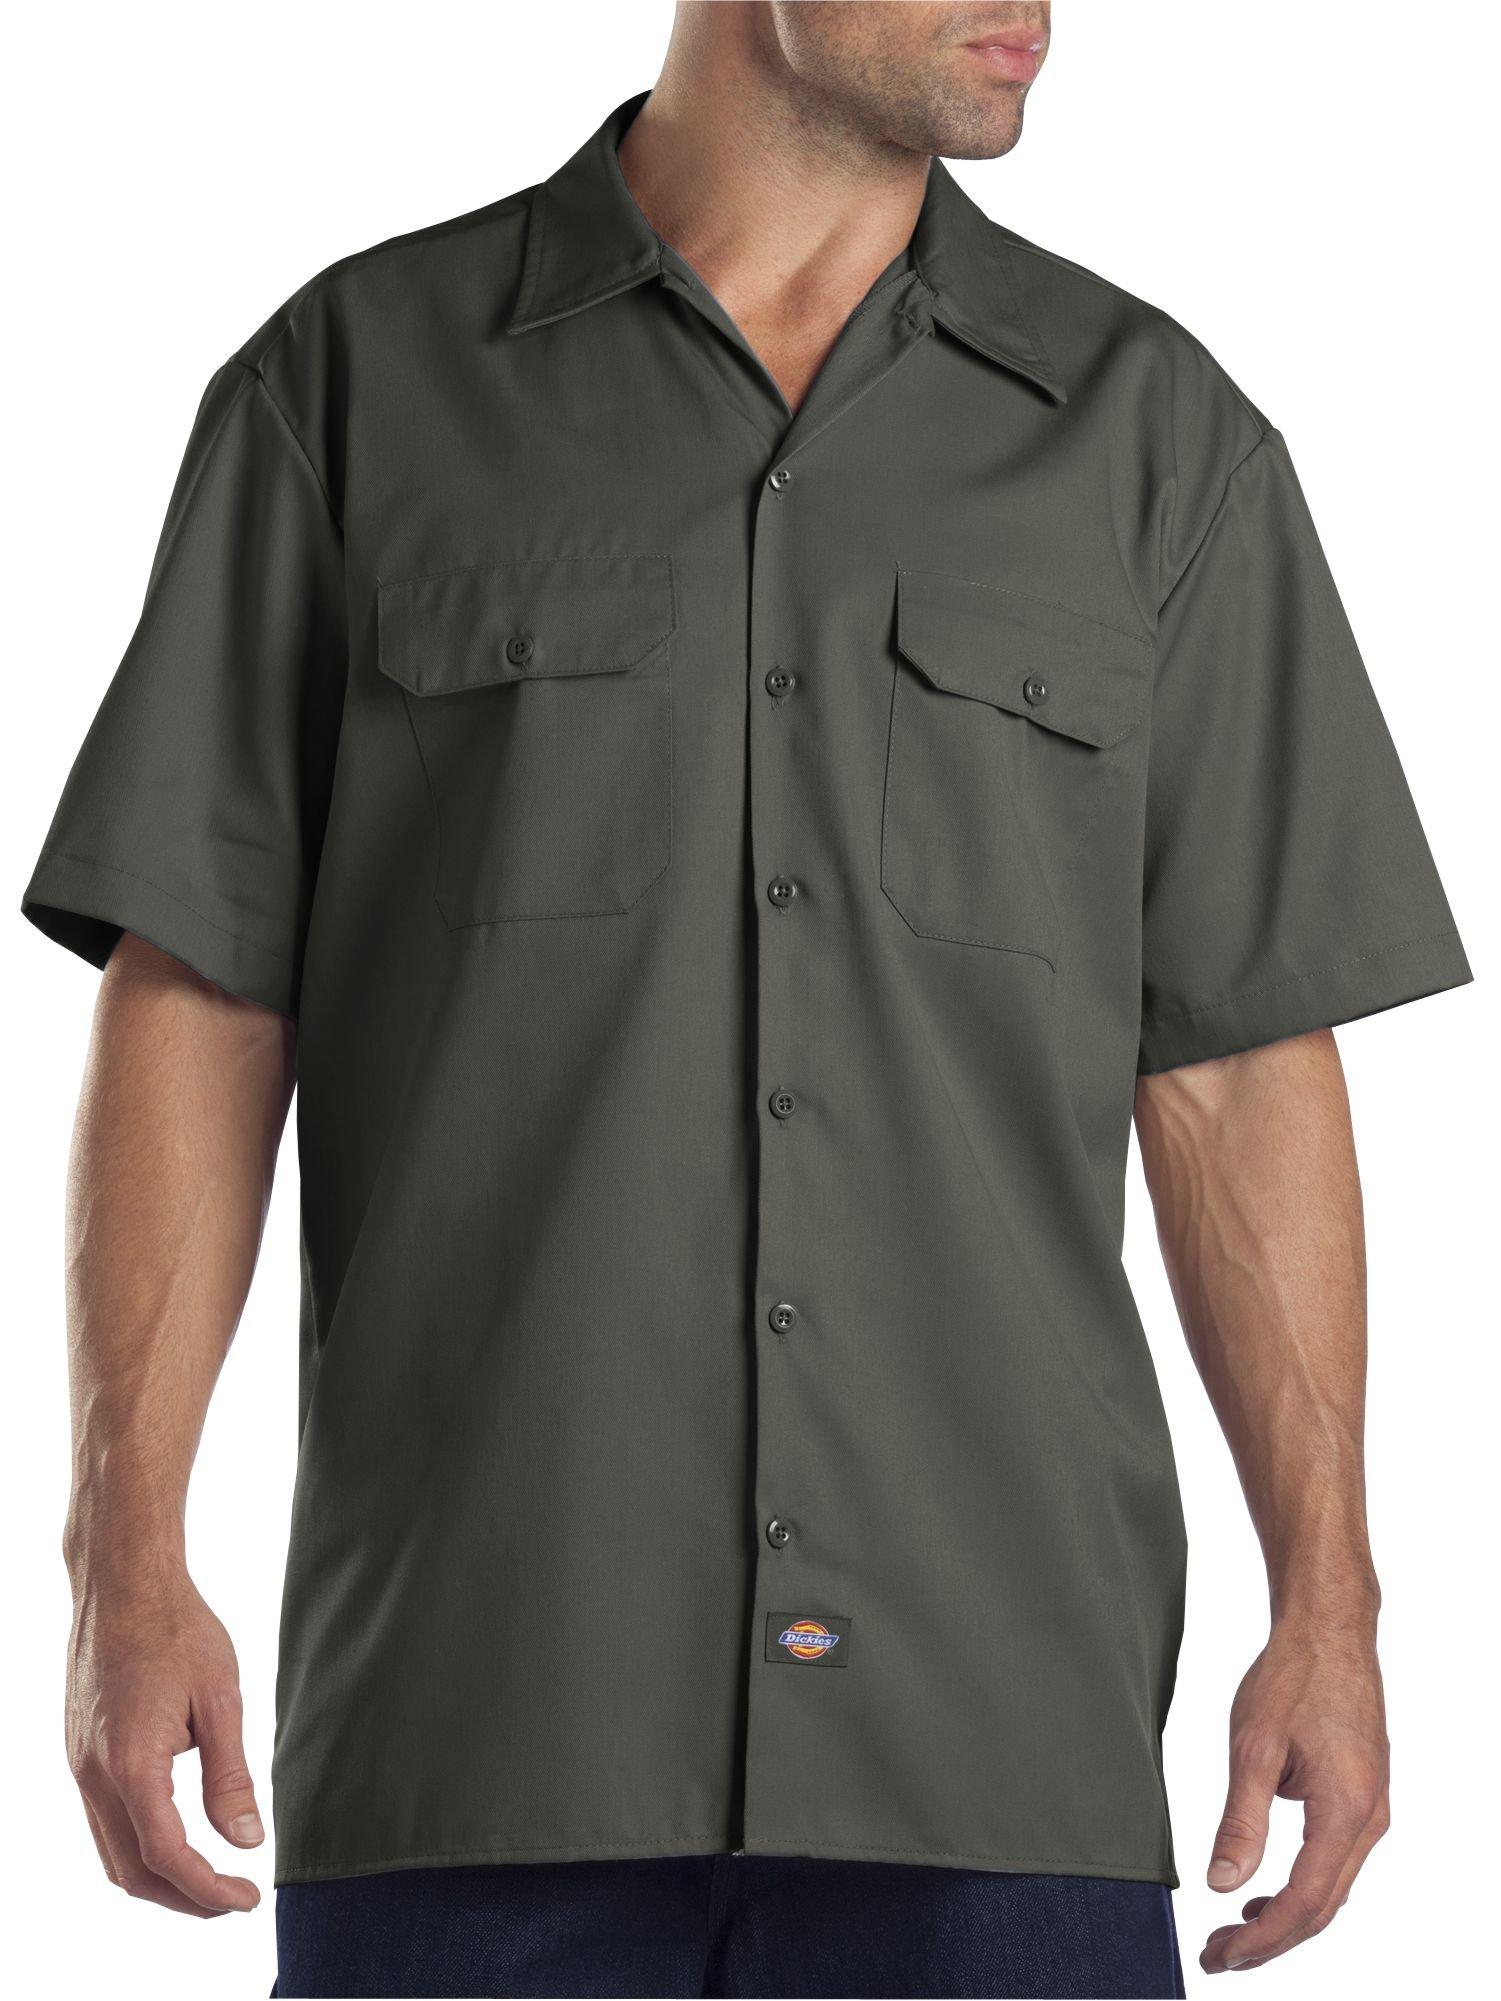 Dickies Men's Short-Sleeve Work Shirt, Olive Green, X-Large